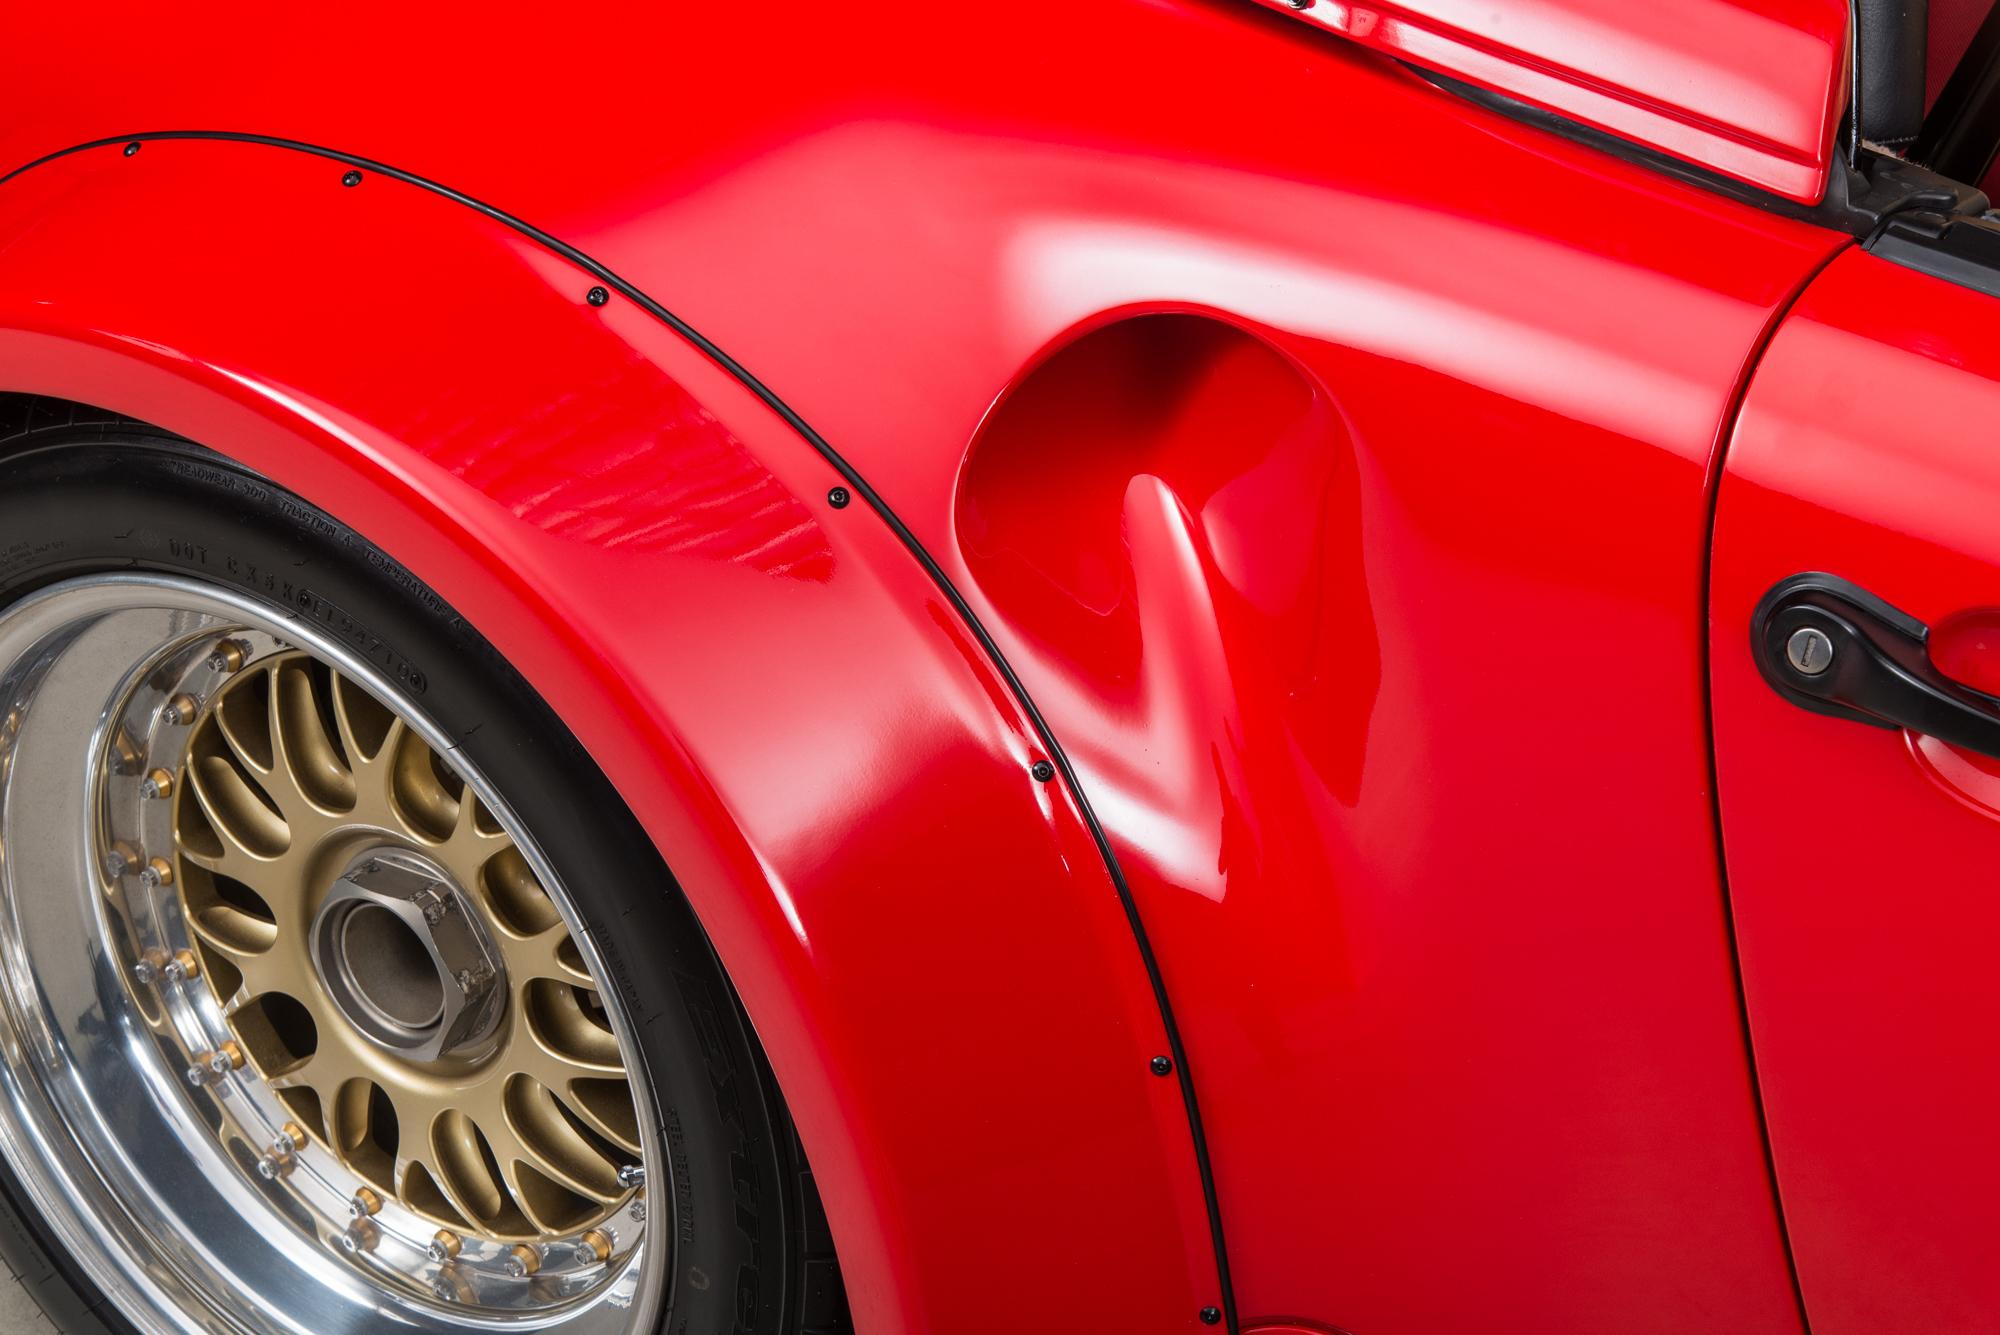 1989 Porsche 962 Twin-Turbo Speedster, GUARDS RED, VIN WP0EB0915KS173533, MILEAGE 3035